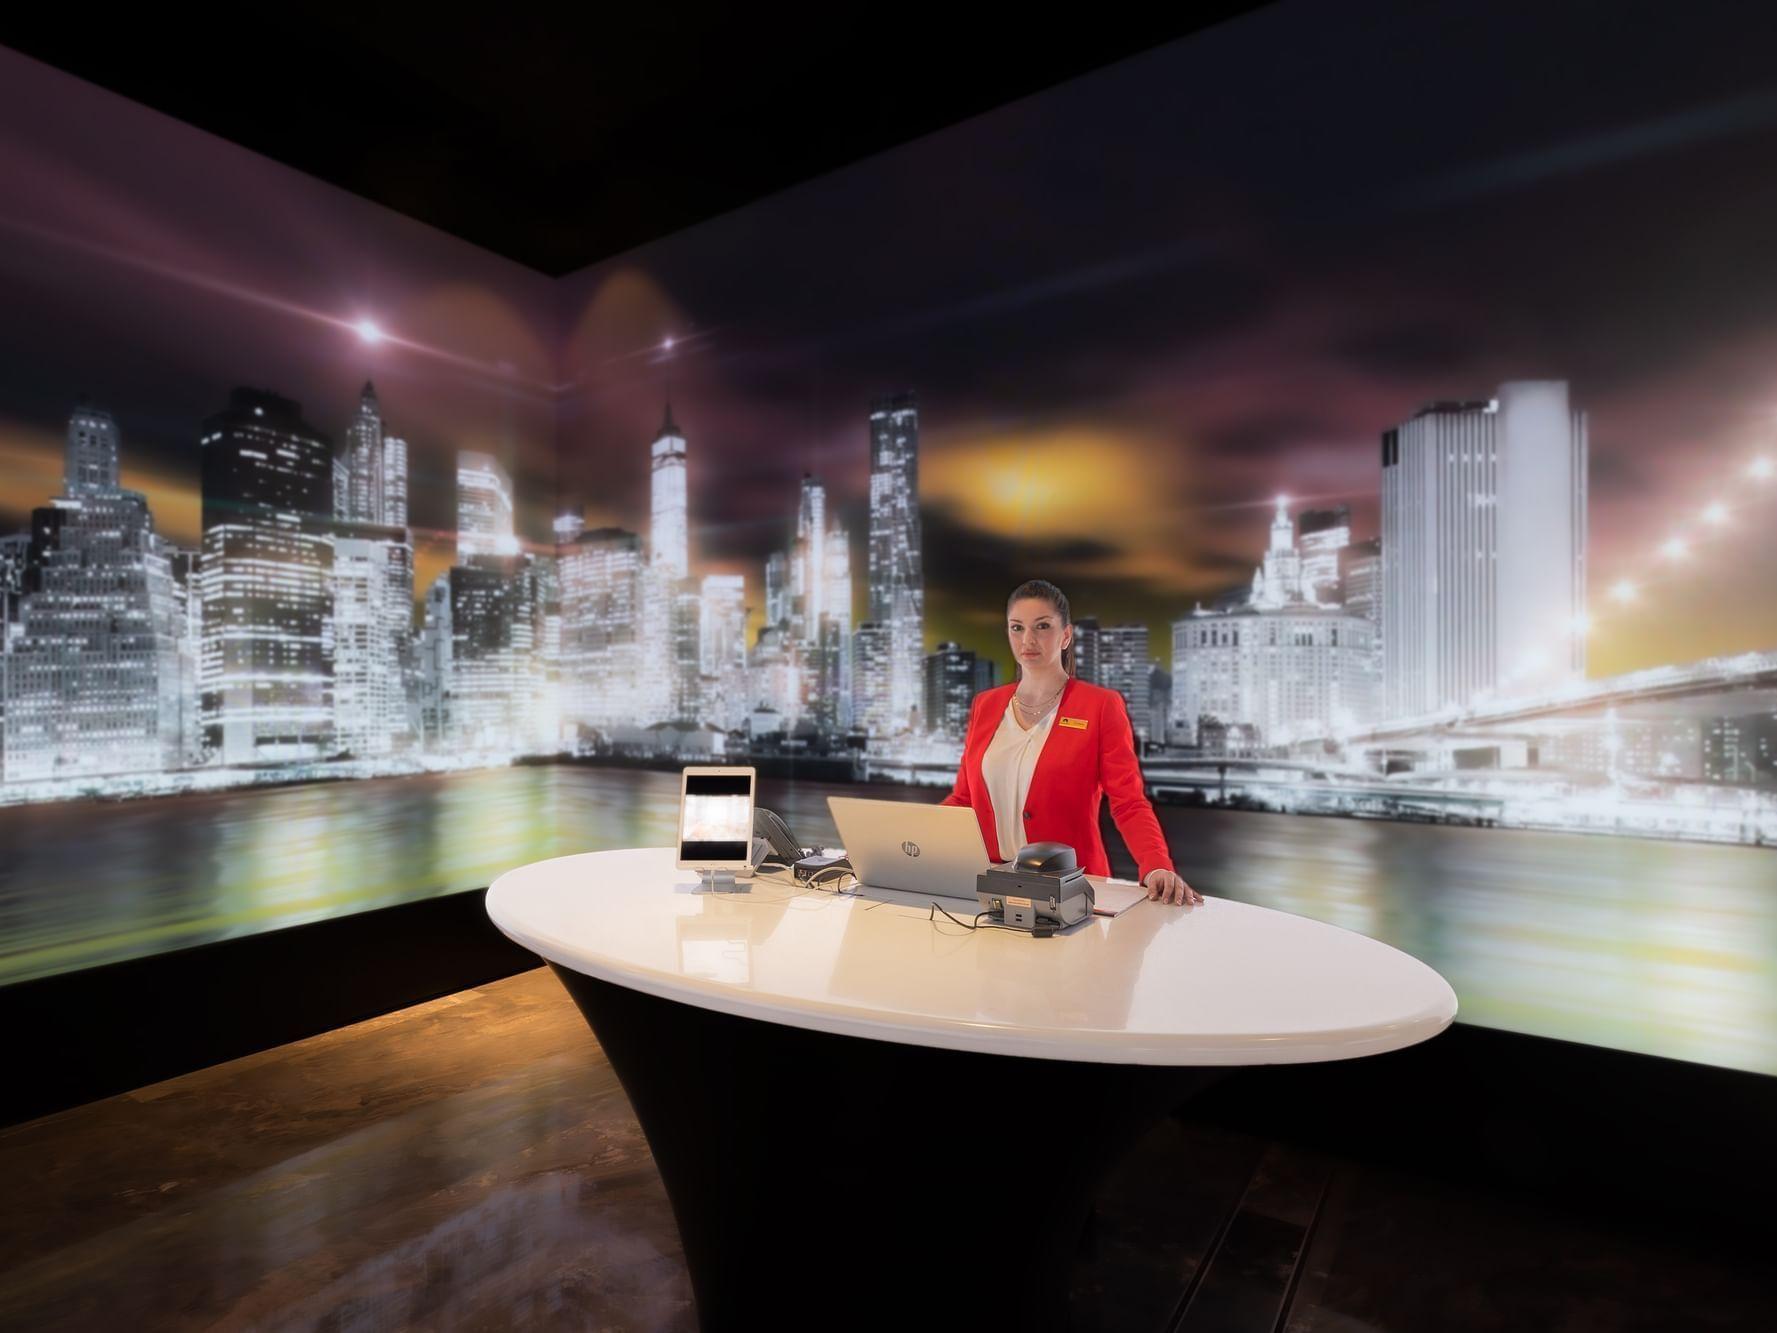 Welcome & Goodbye Desk at Paramount Hotel Dubai